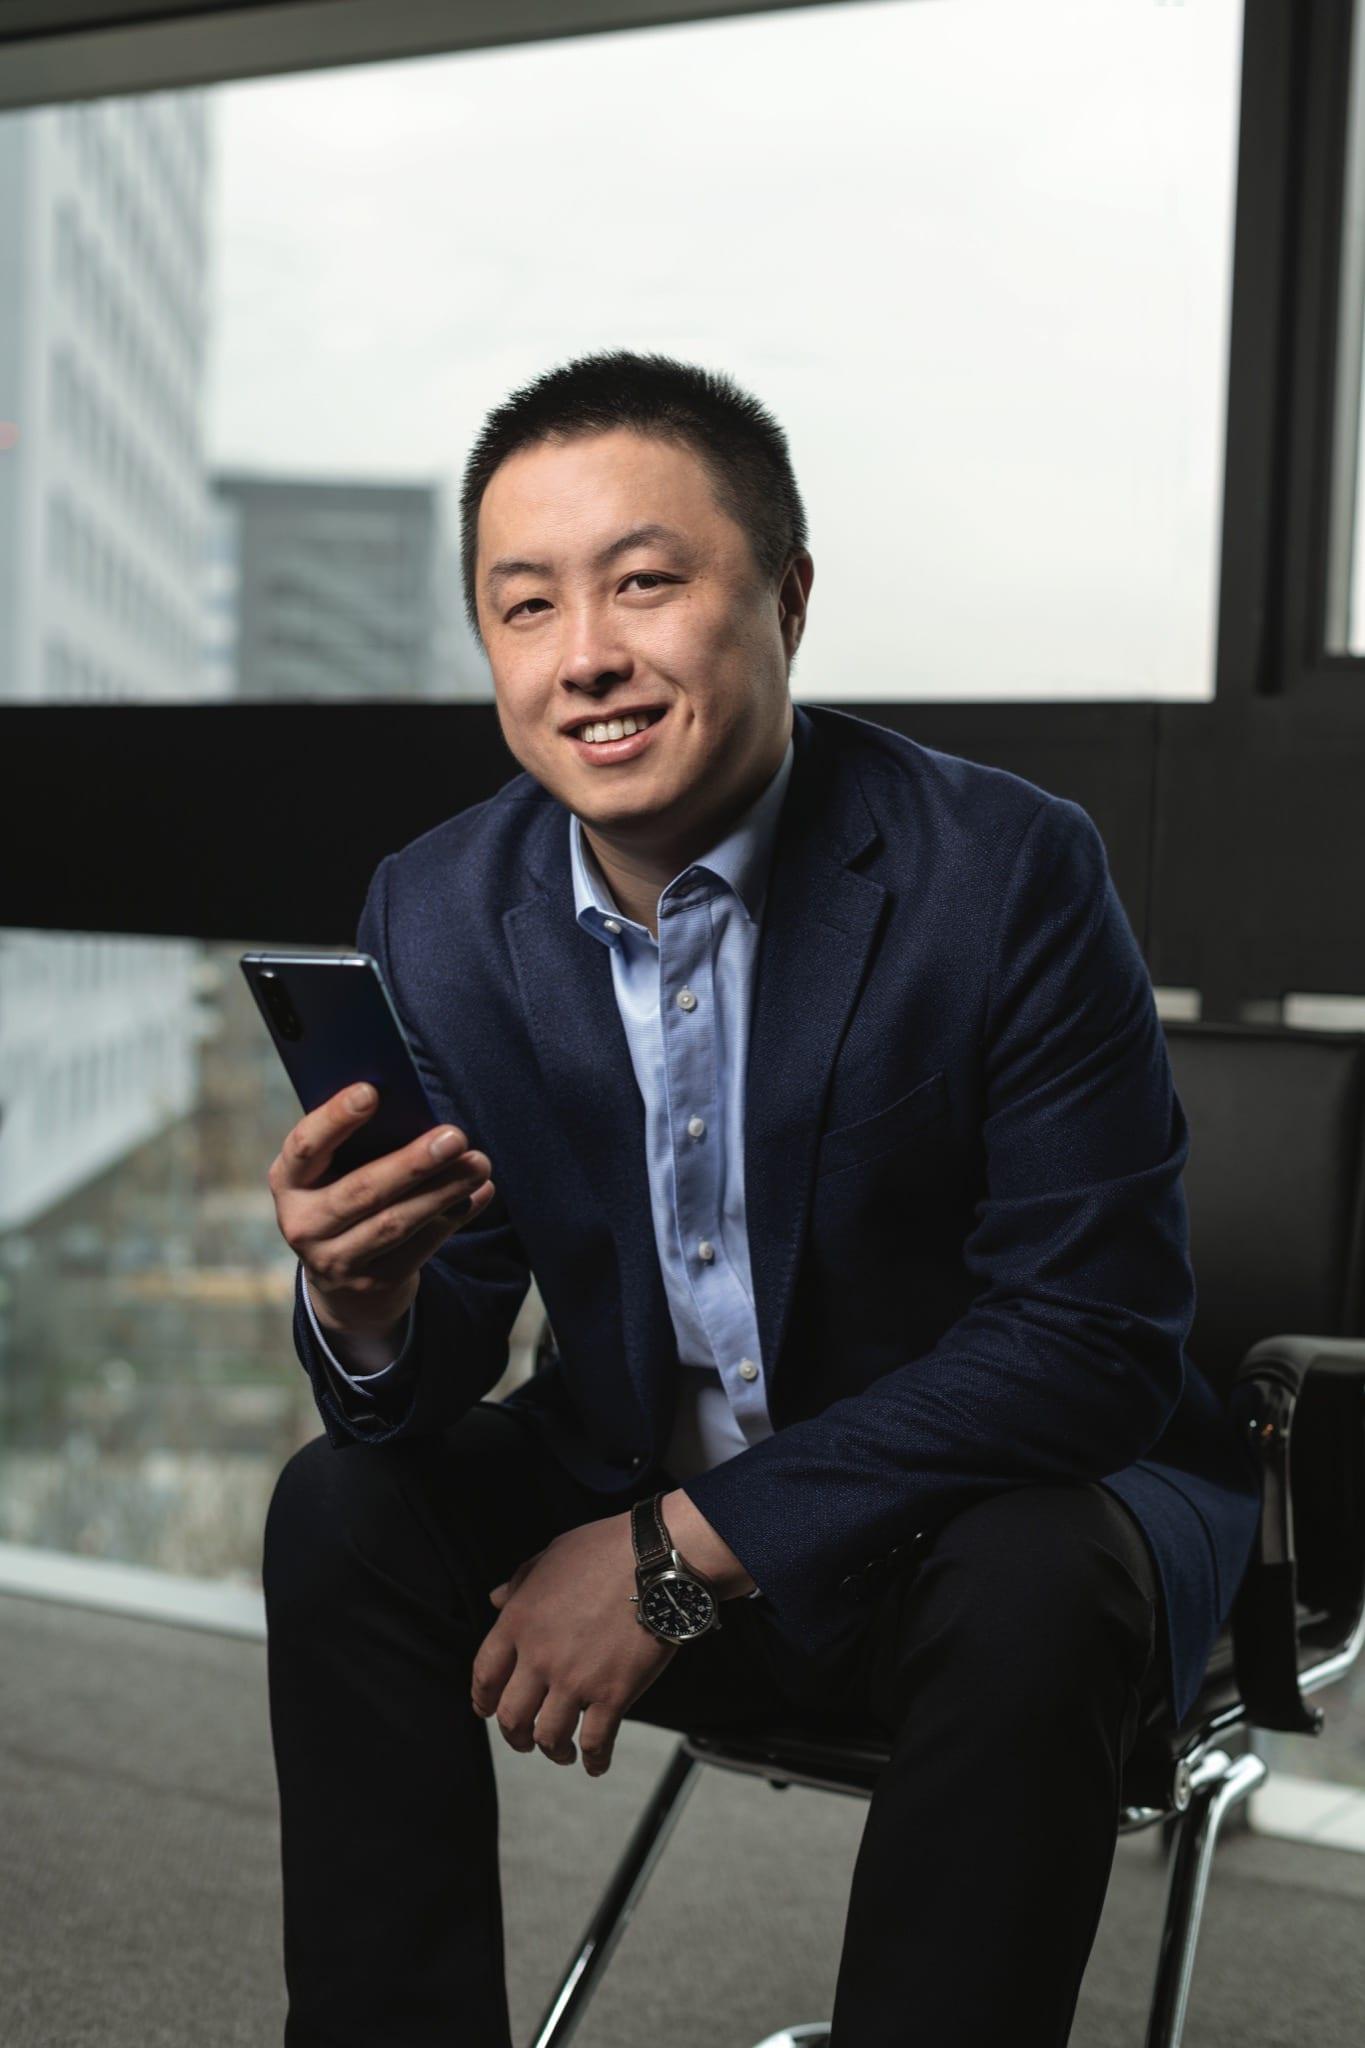 Unul din cele mai puternice branduri de smartphone-uri din lume, OPPO, vine in Romania. Interviu cu Shaohua Yang, General Manager Green Leaves Technical, Distribuitor OPPO Romania